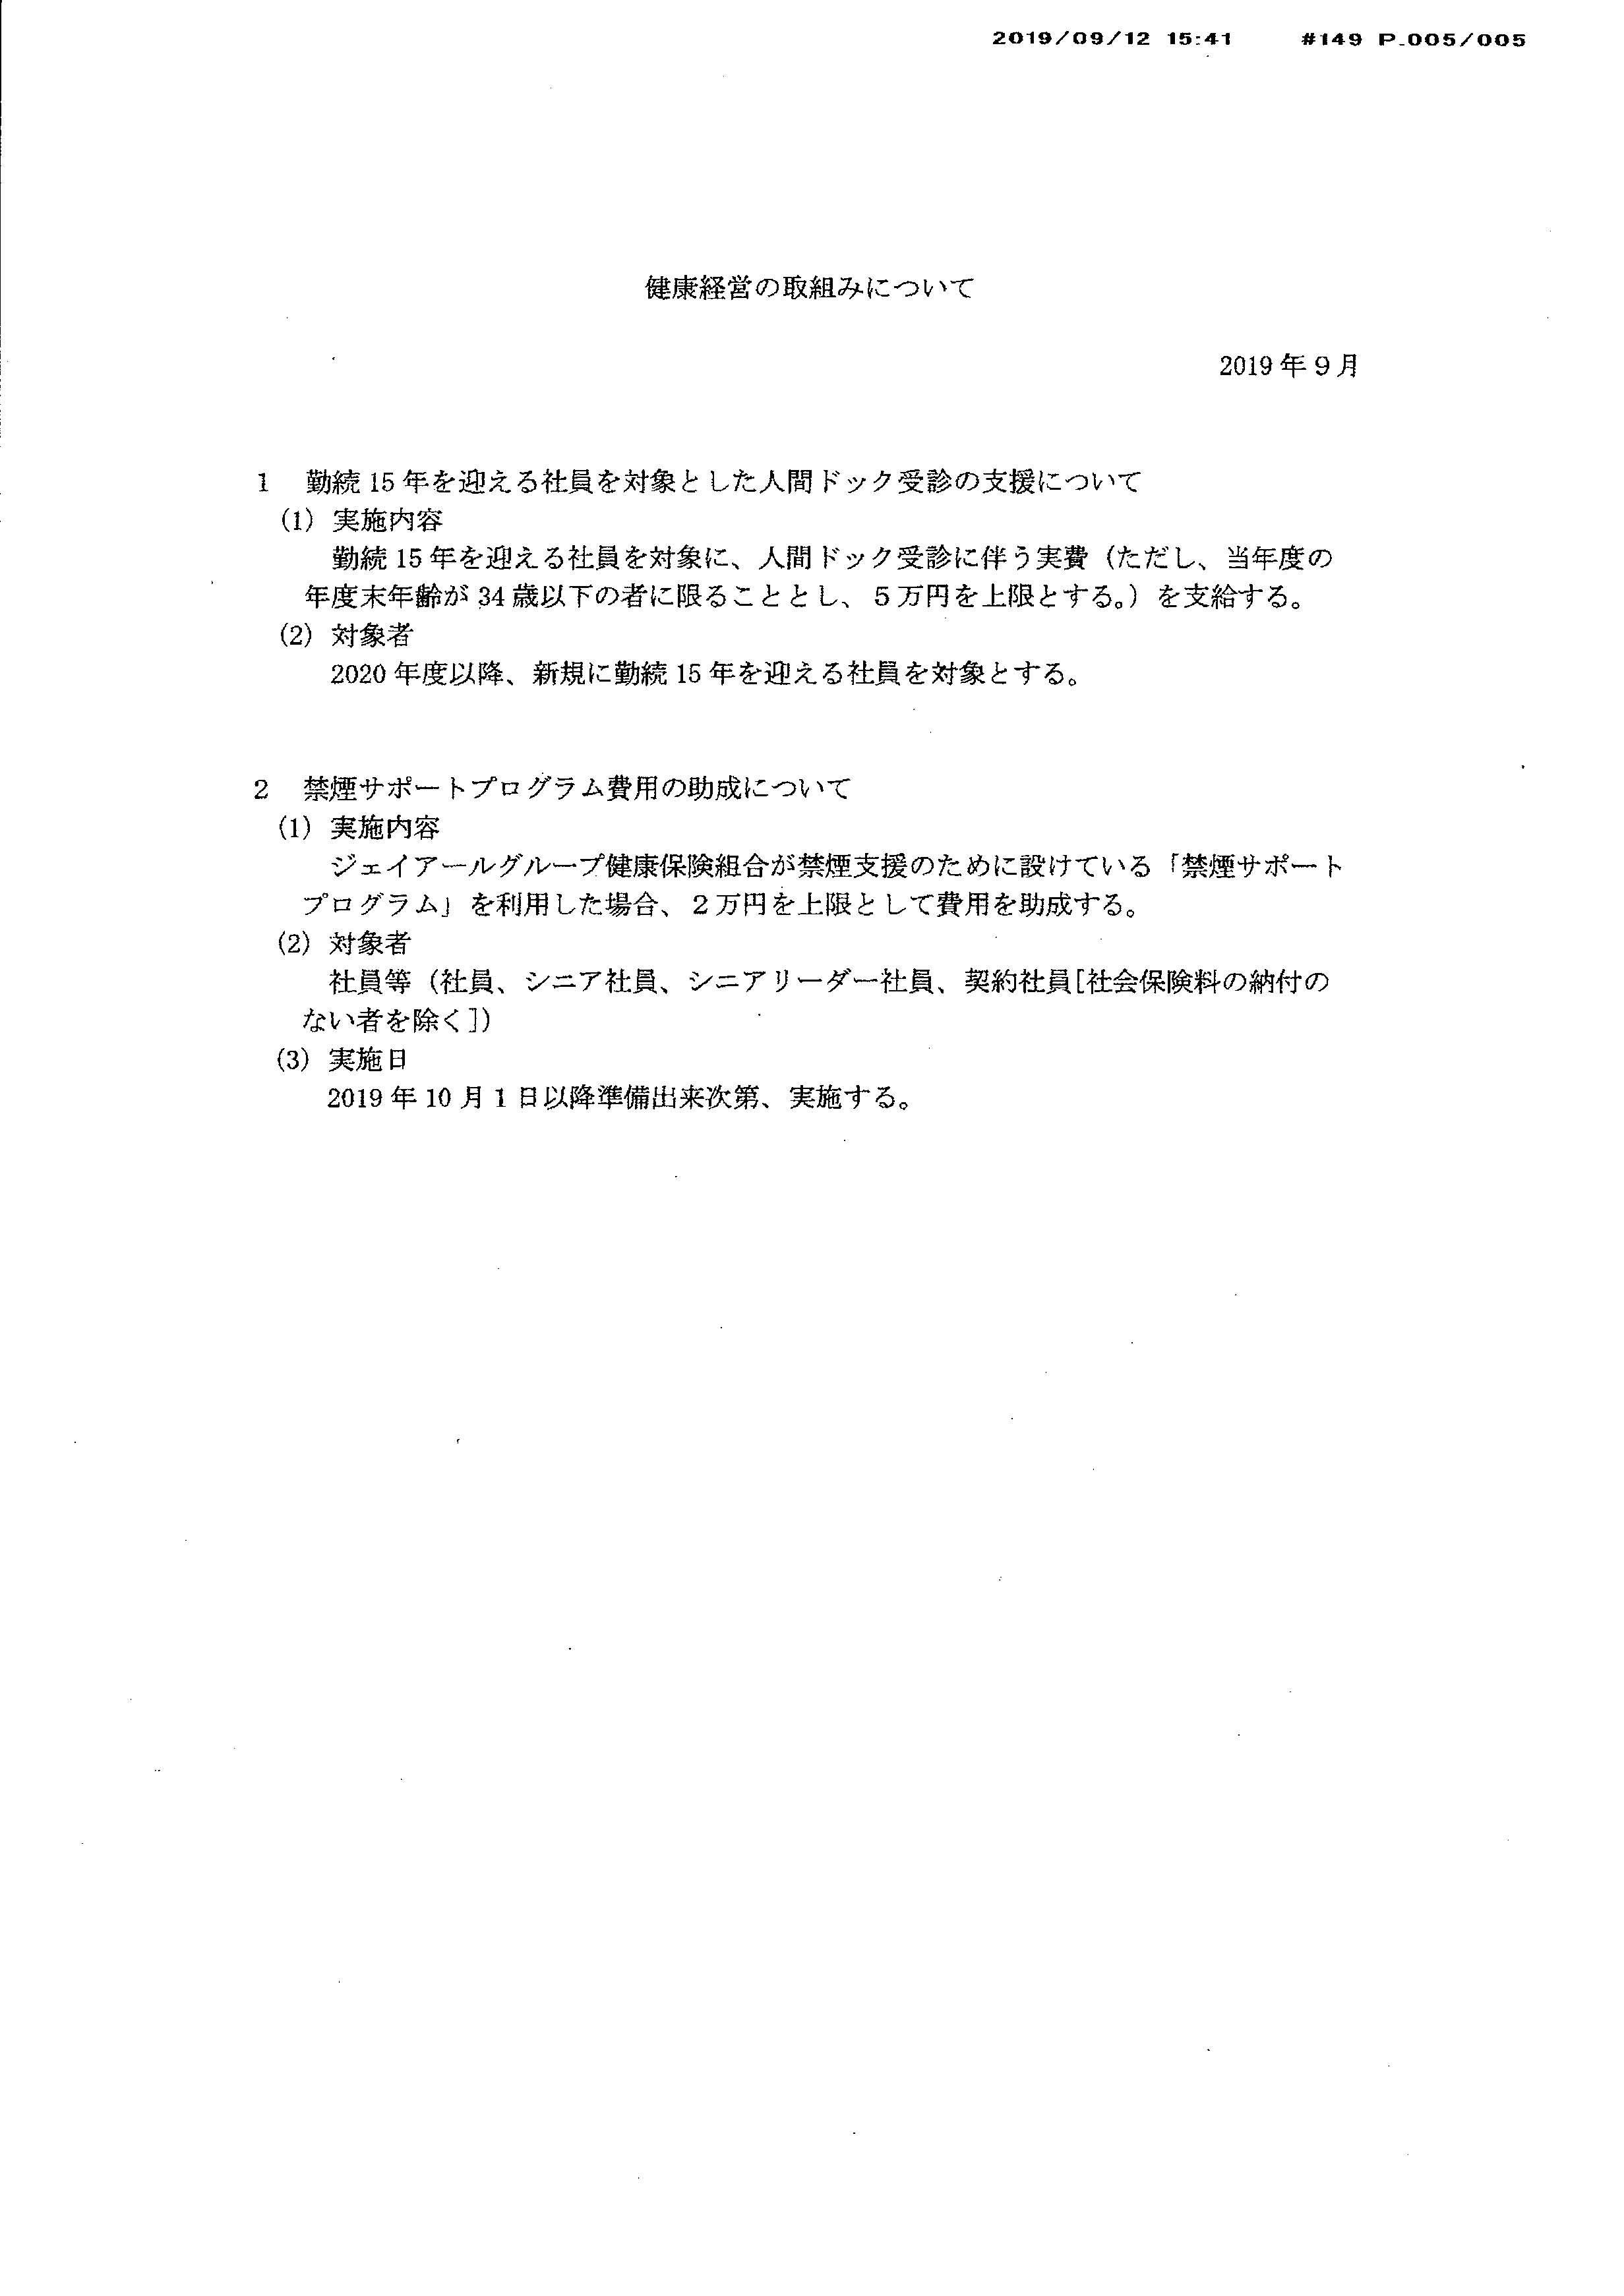 JR西日本の施策~治療支援休暇の対象拡大について、短時間勤務制度の見直しについて、再就職支援の見直しについて、テレワーク制度の本施行について、健康経営の取組みについて_d0155415_11380091.jpg